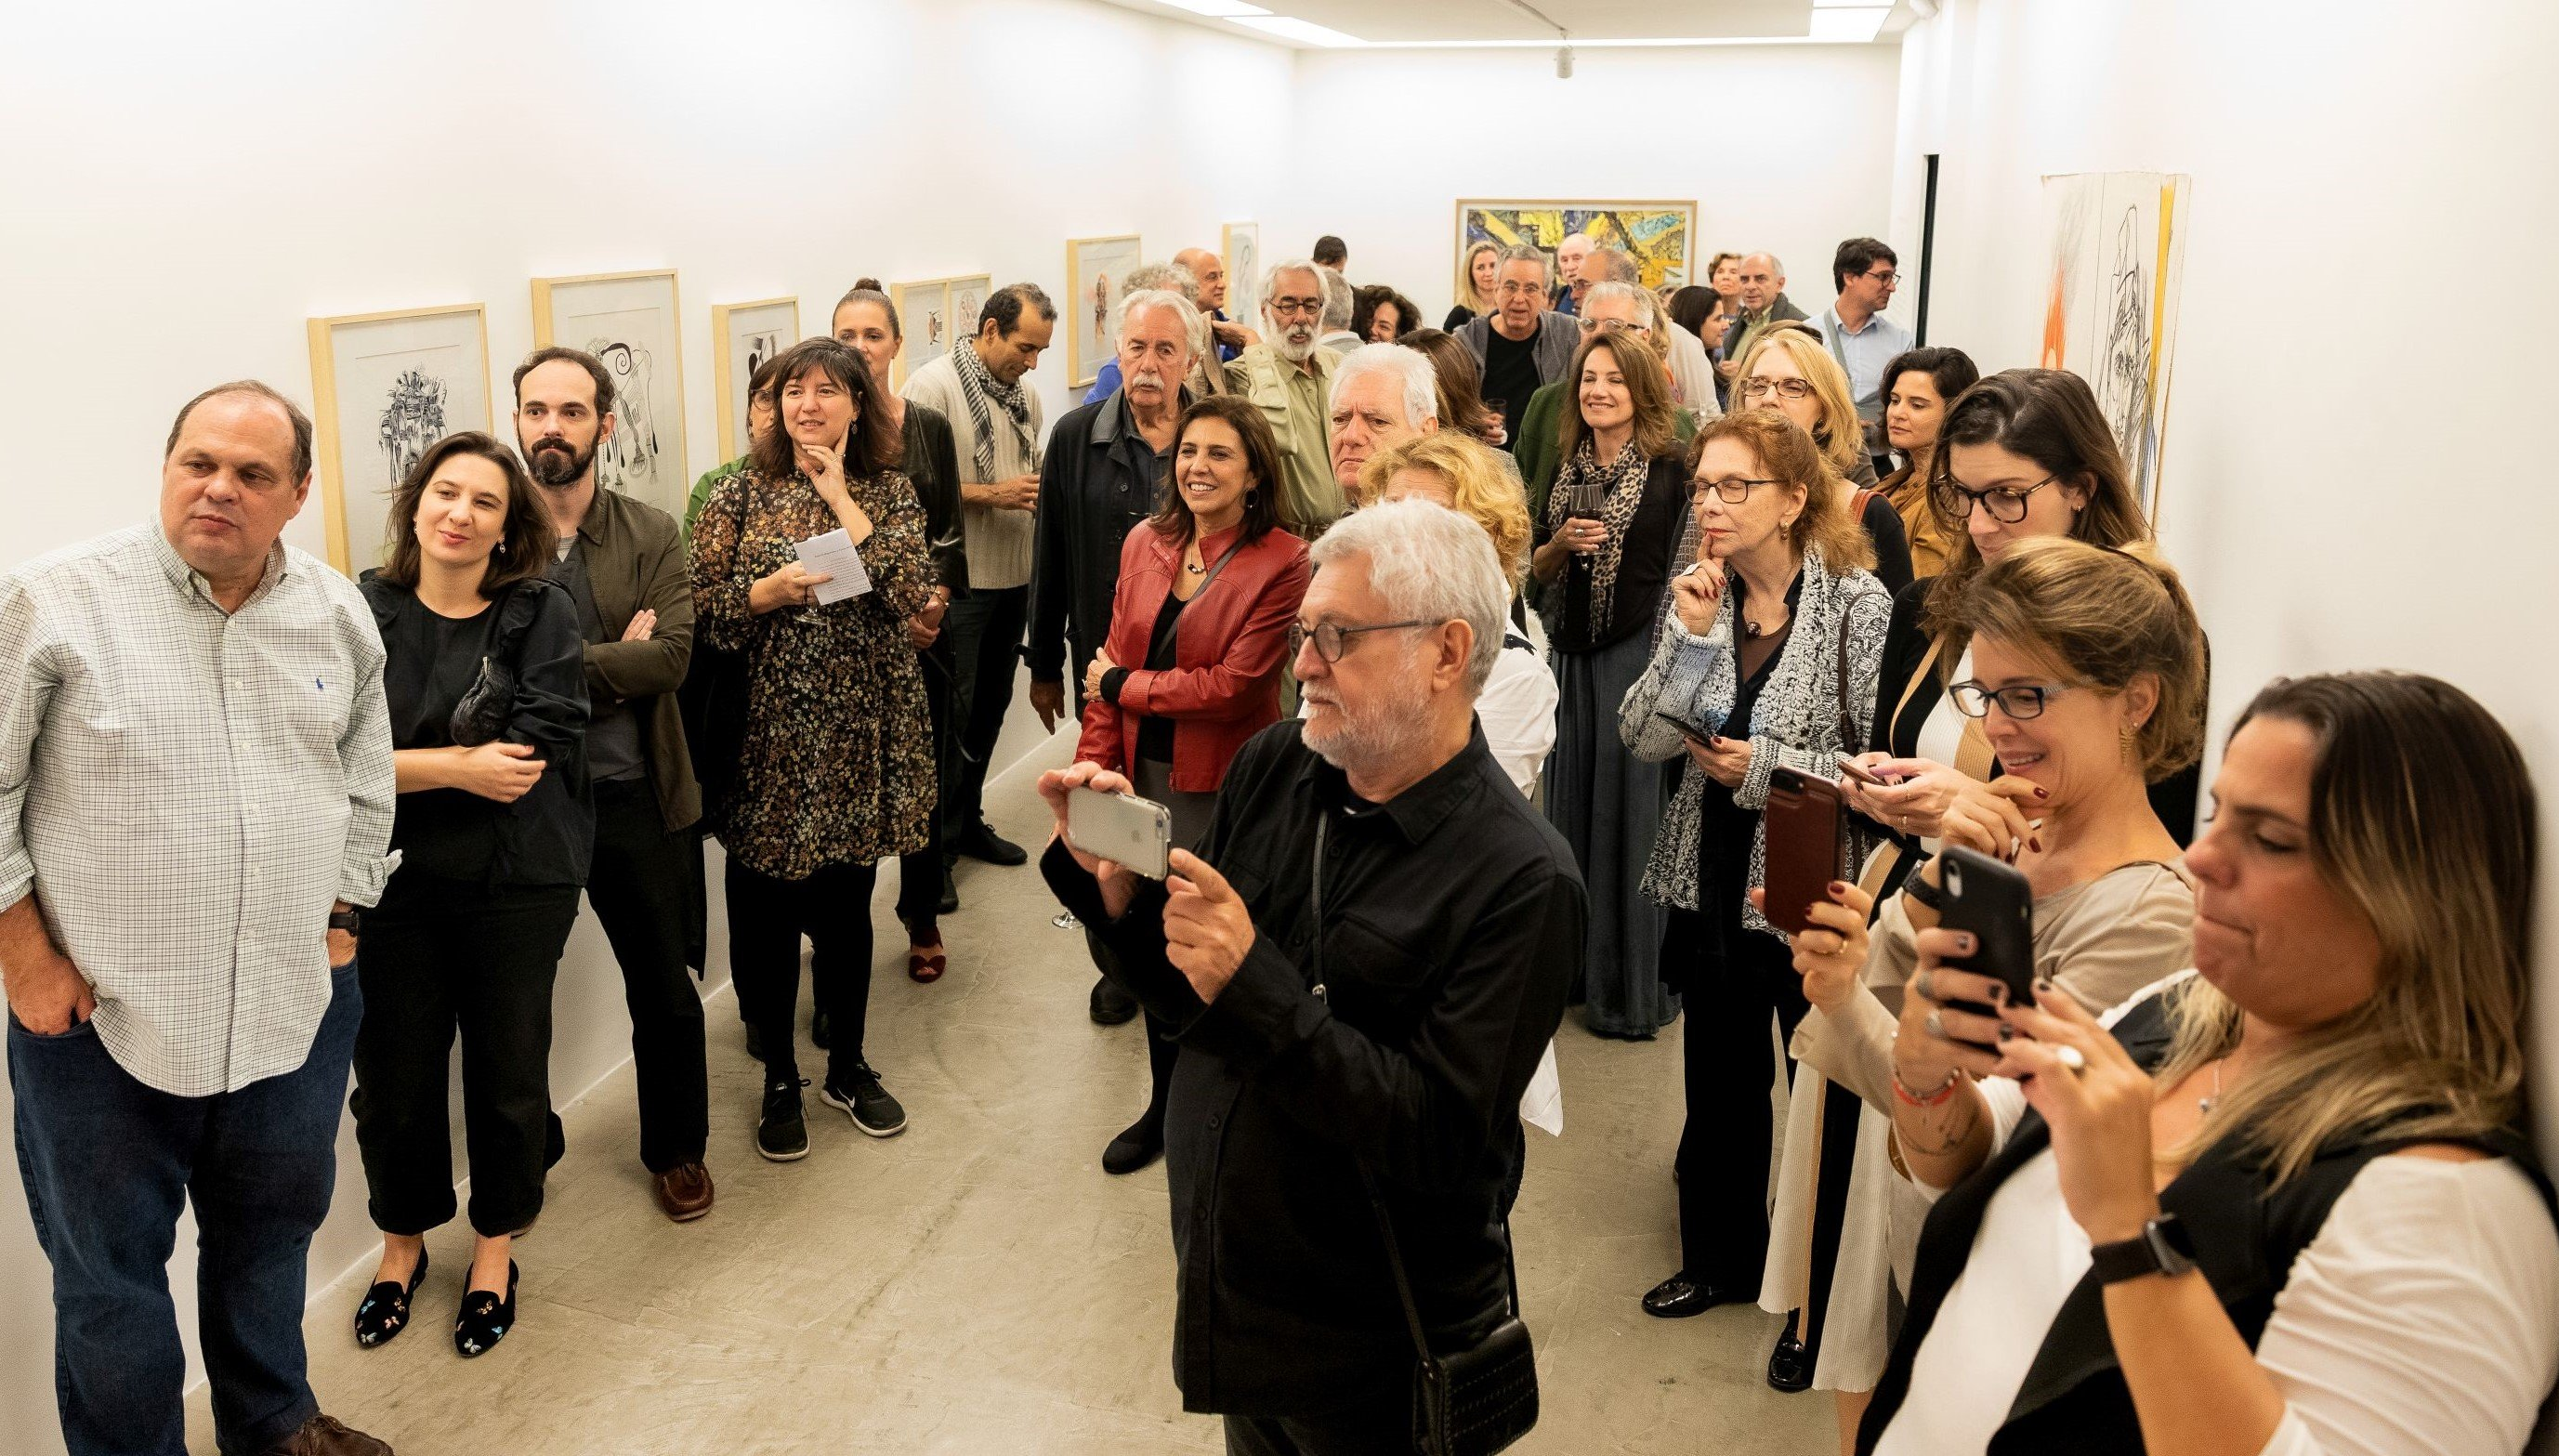 Todos atentos à performance de Cabelo /Foto: Alan Miguel Gonçalves